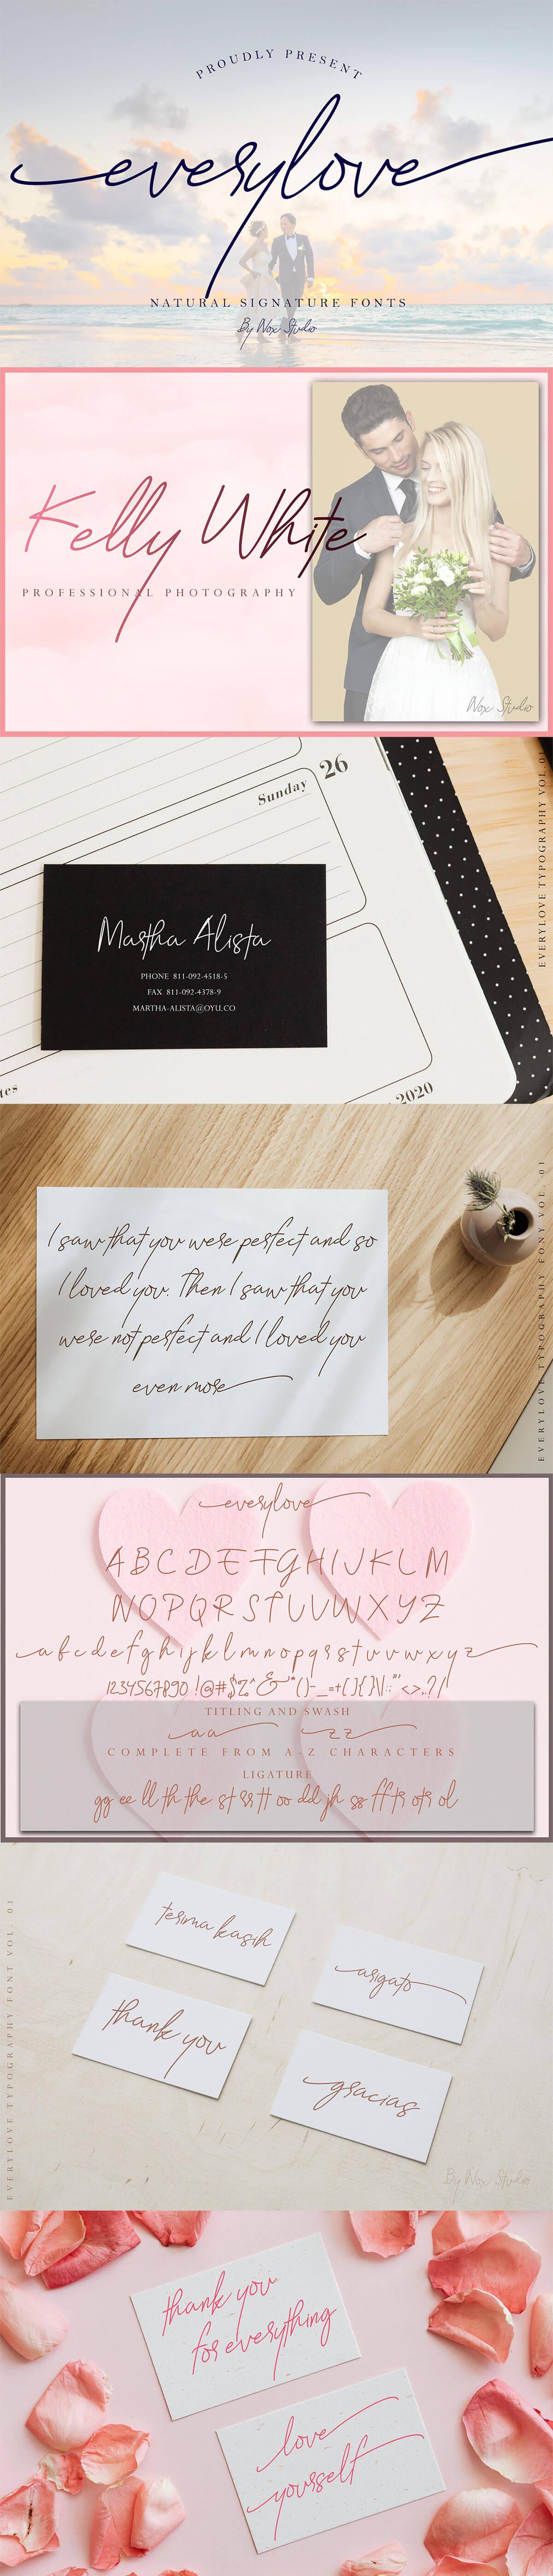 Free Everylove Handwritten Typeface